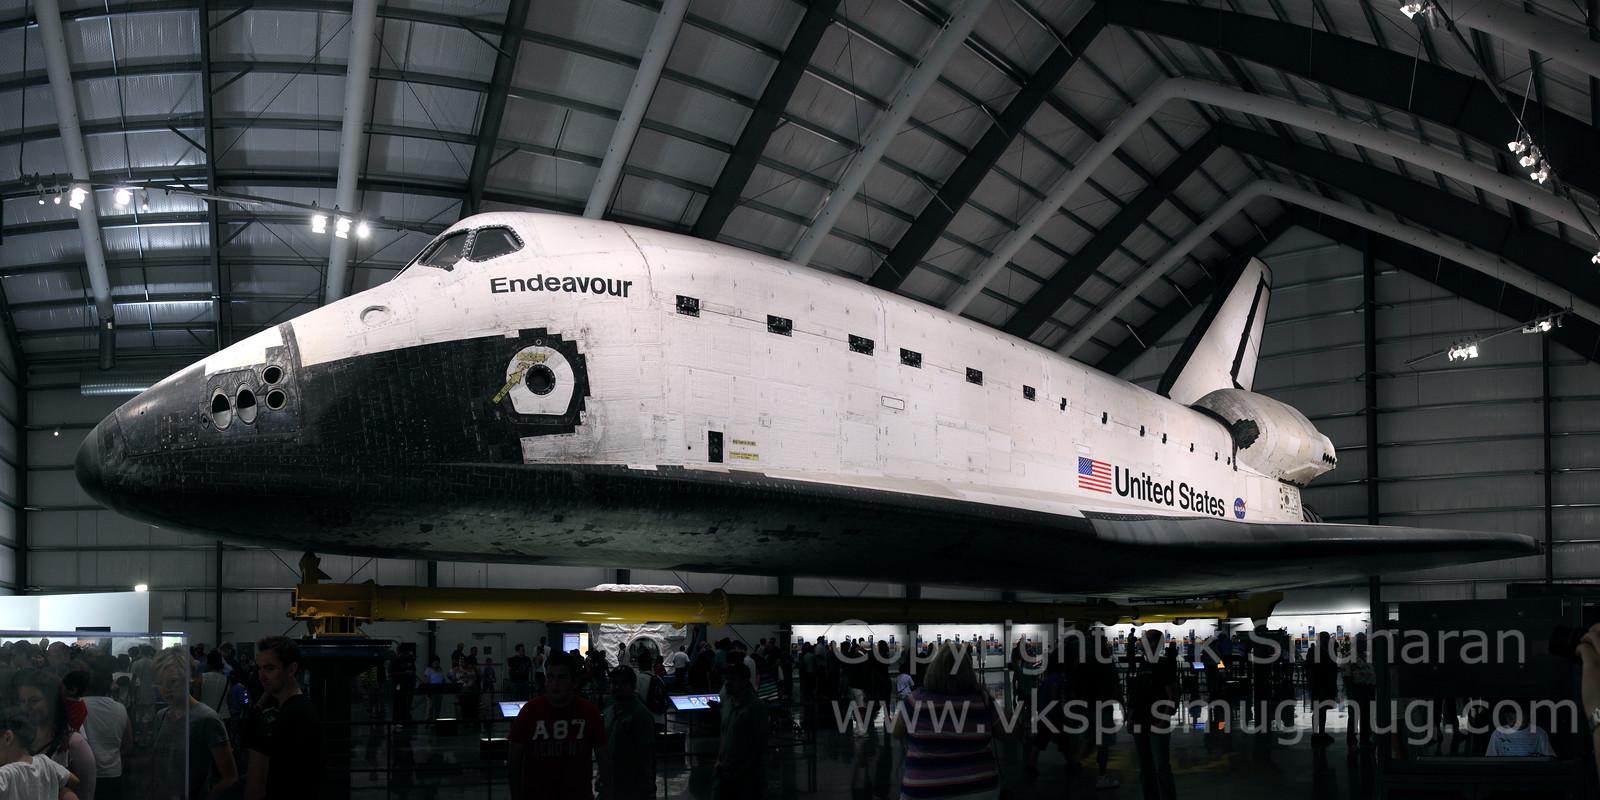 http://www.vksphoto.com/Airplanes/Air-Shows/Panoramas-Composites/i-JN7TTnp/0/X3/COMPOSITE2%207-27-13-X3.jpg